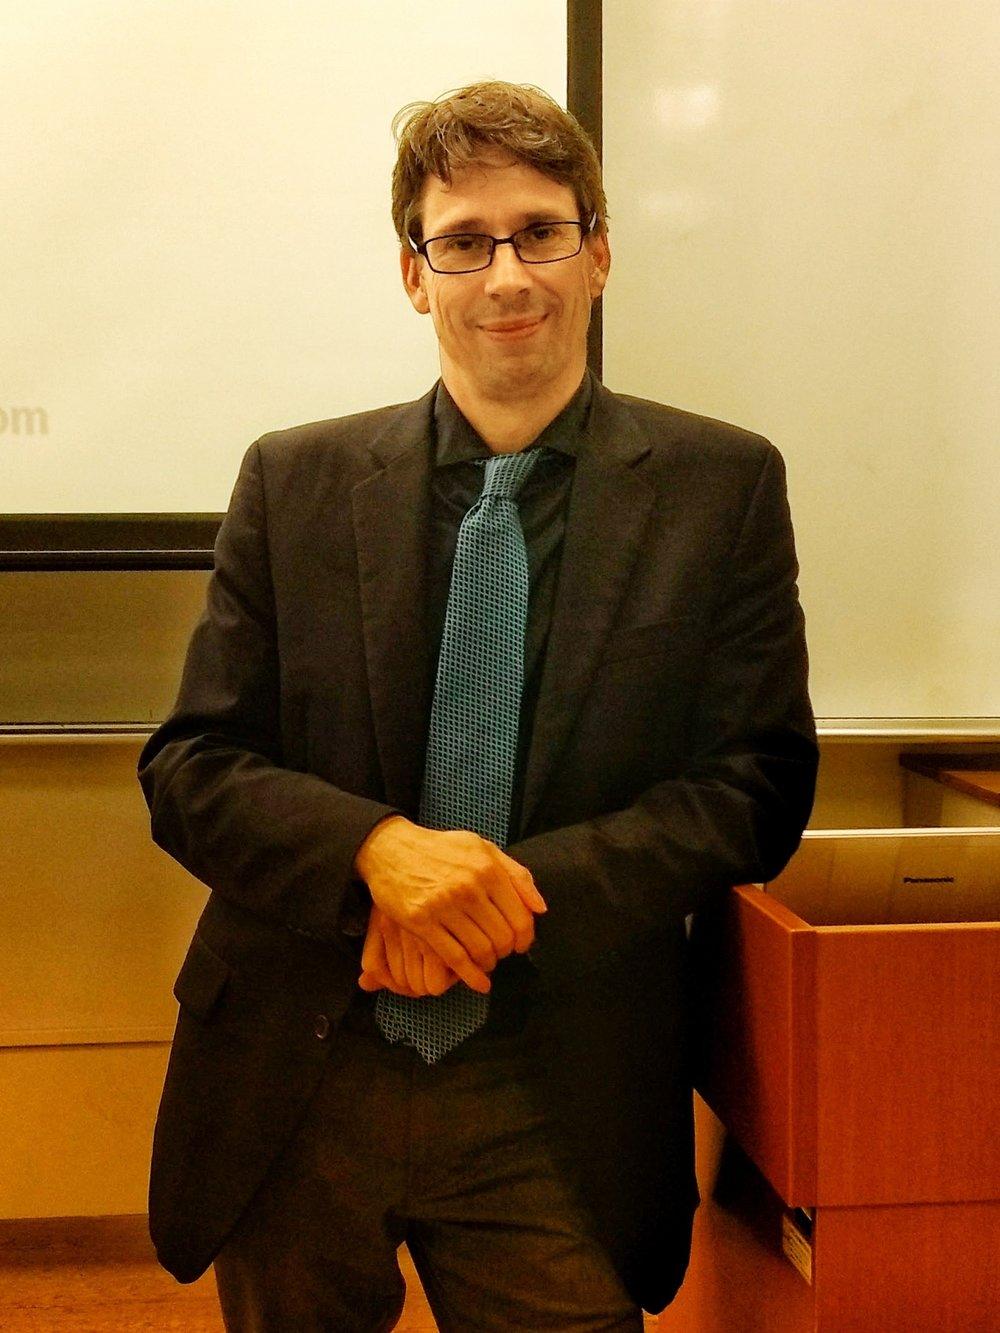 Hendrik G. Roozen - New Mexico大学 CASAA教授(New Mexico University CASAA, Professor)www.communityreinforcement.nl